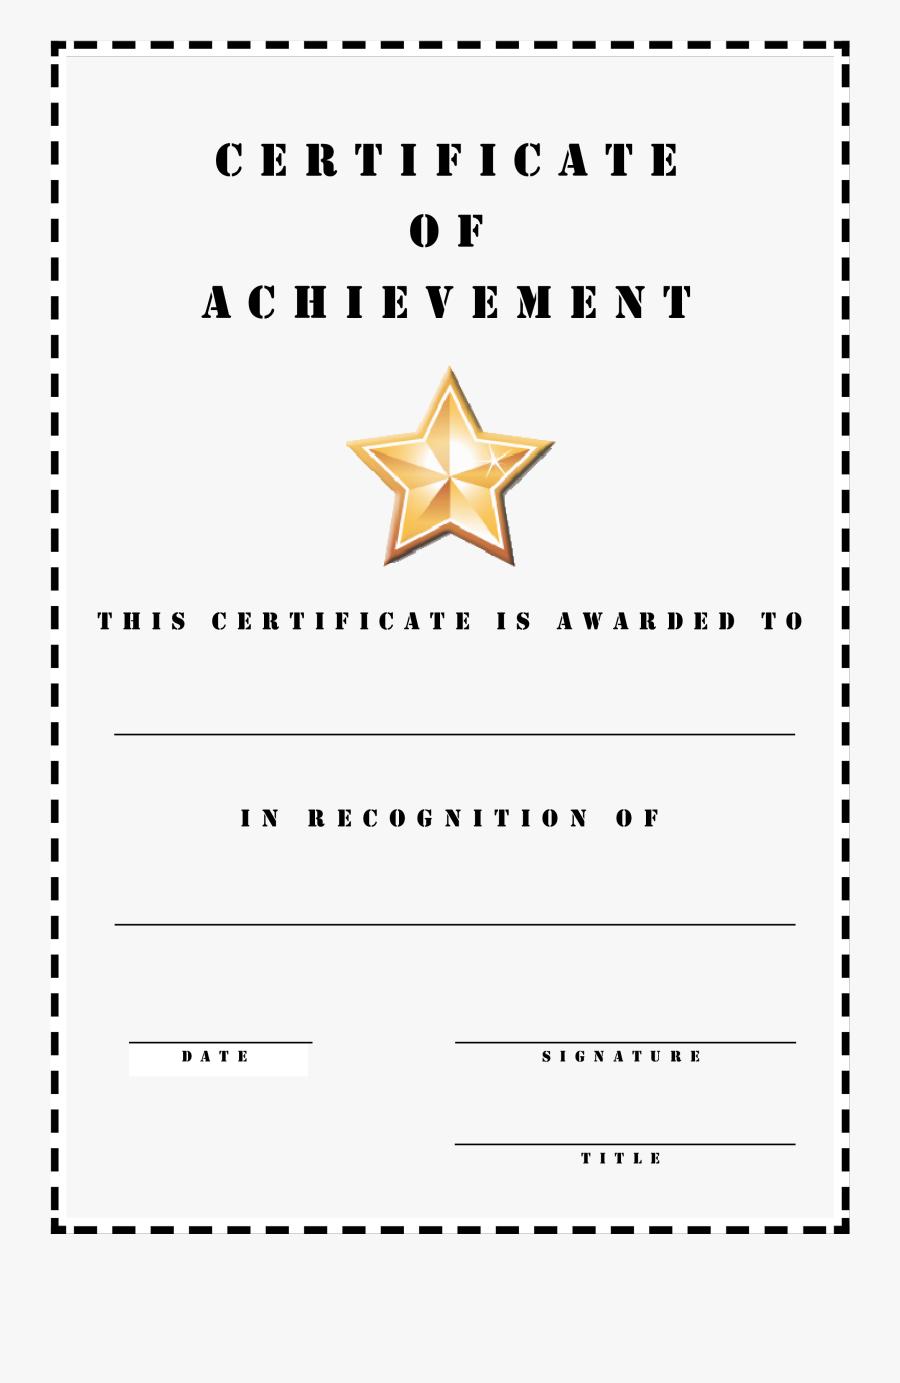 Clip Art Honor Roll Certificate Template - Certificate Template A4 Portrait, Transparent Clipart